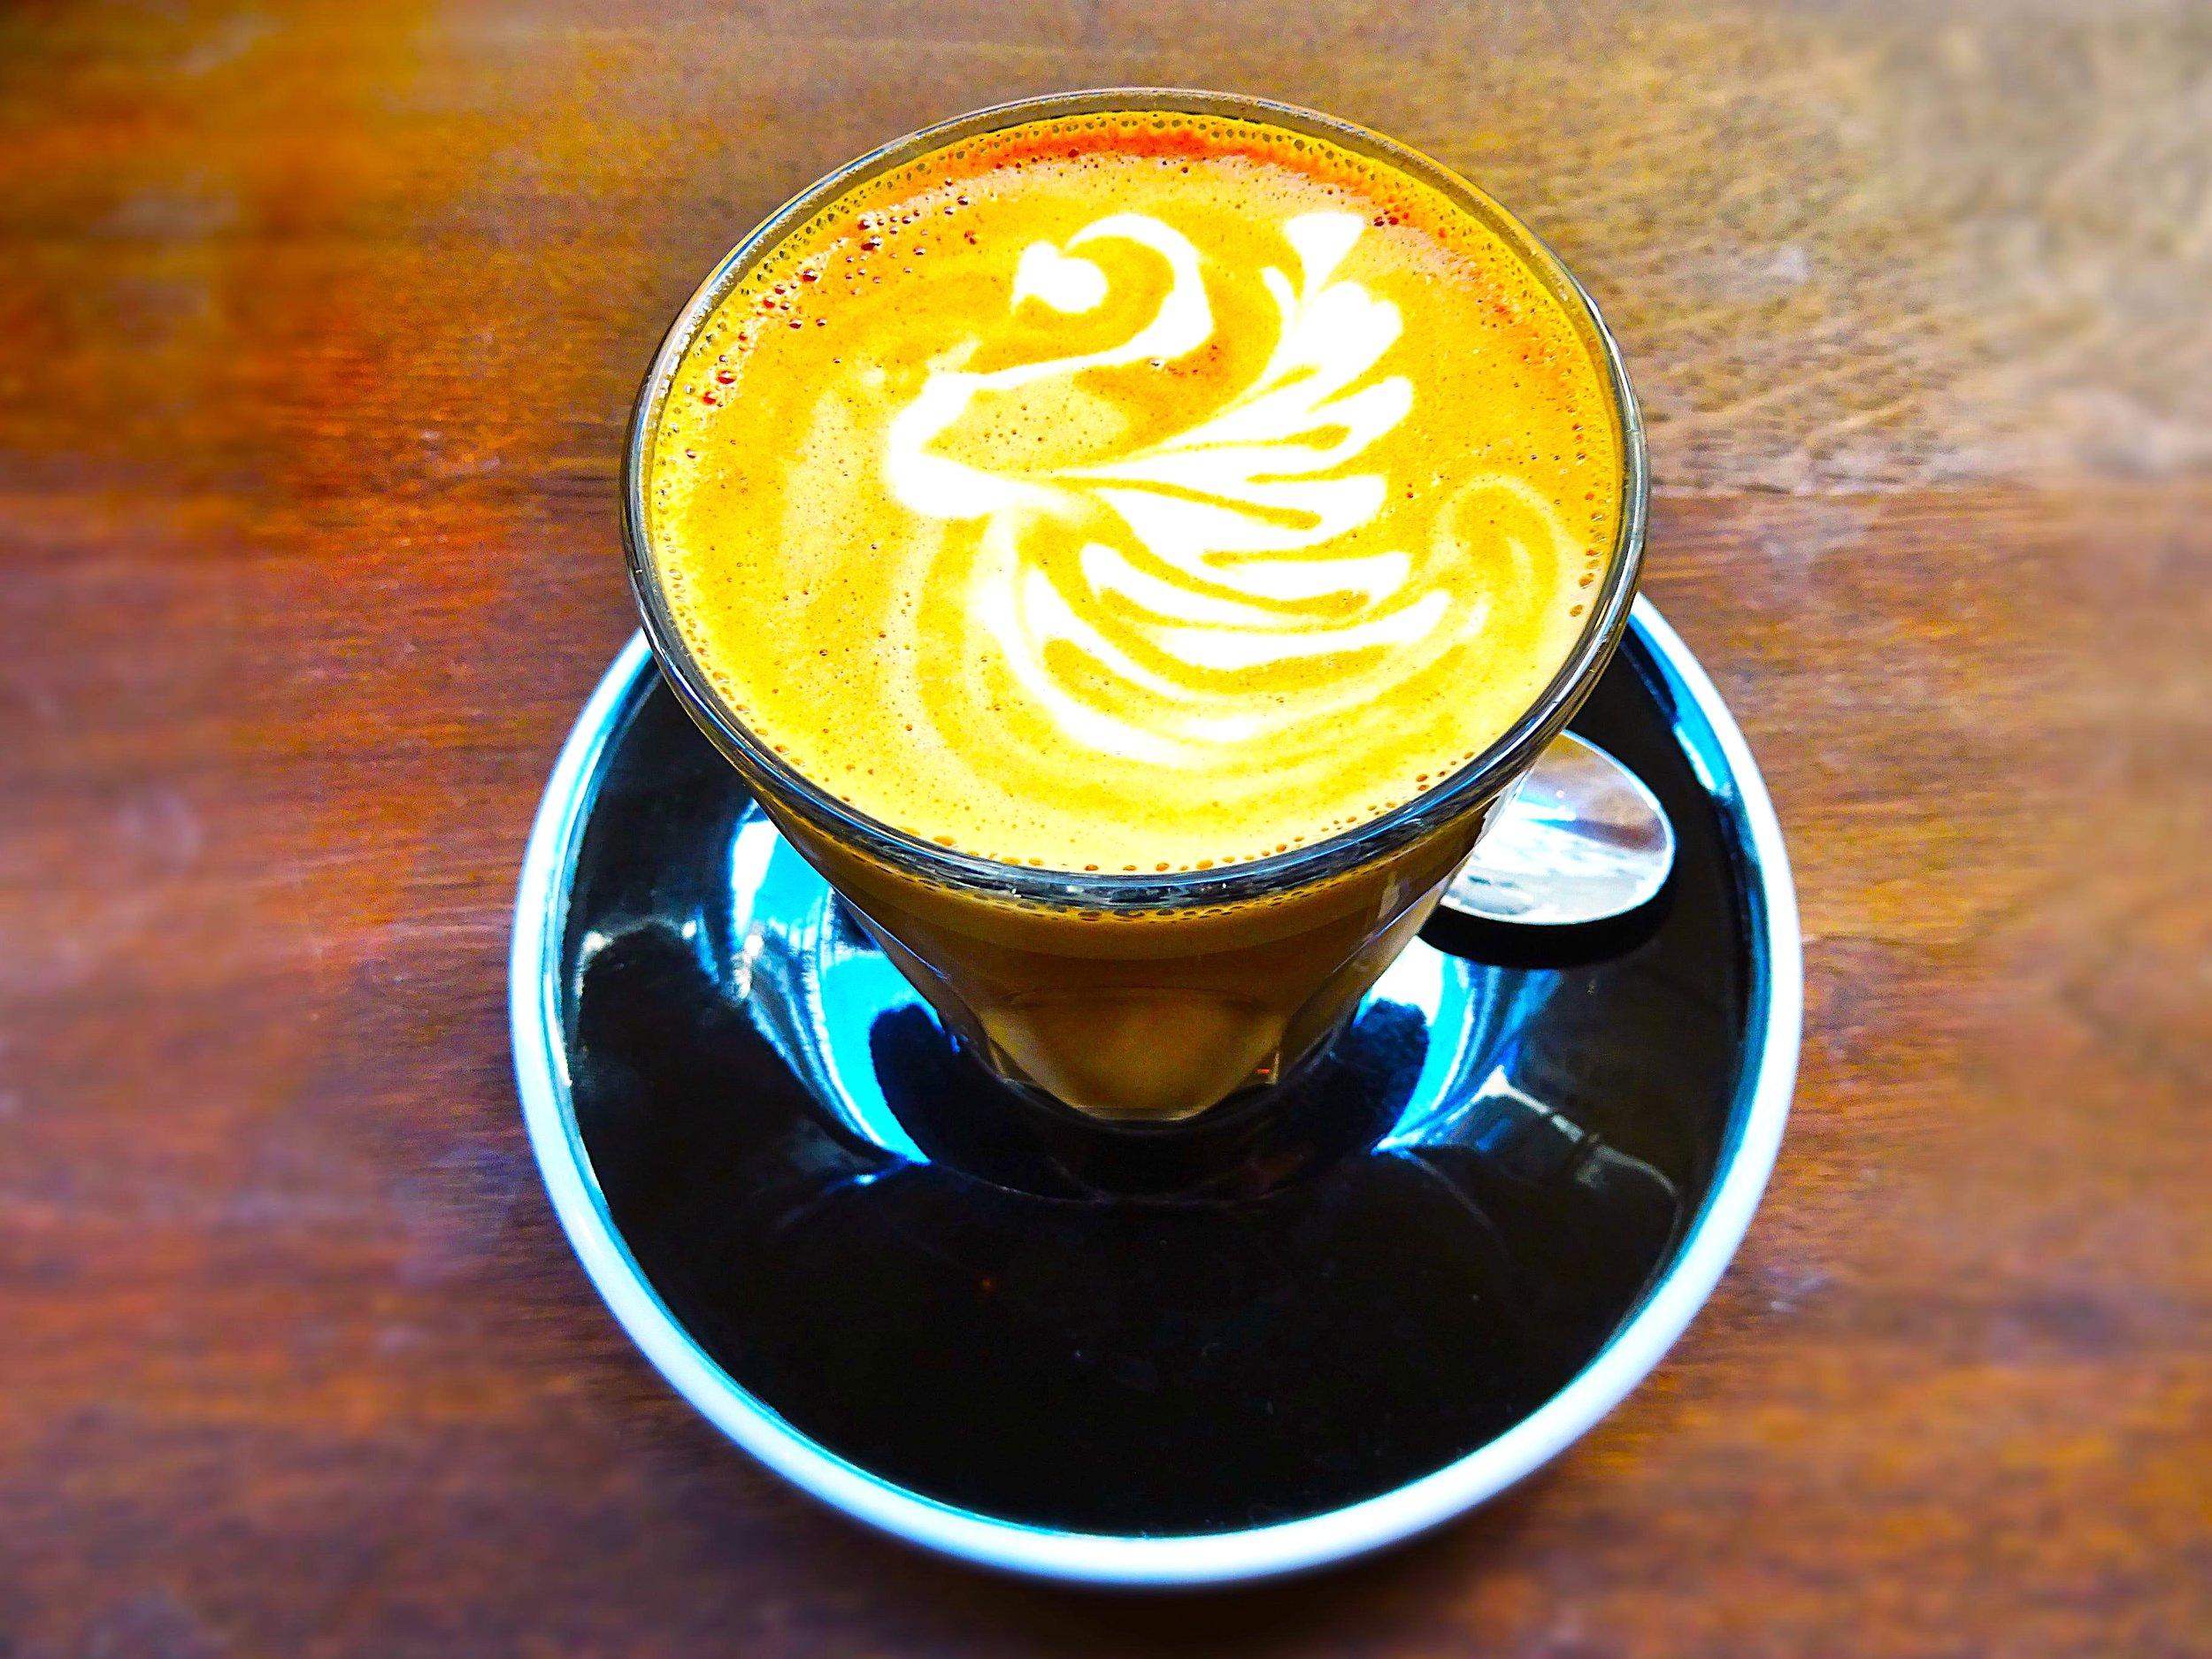 beverage-caffeine-cappuccino-575278.jpg